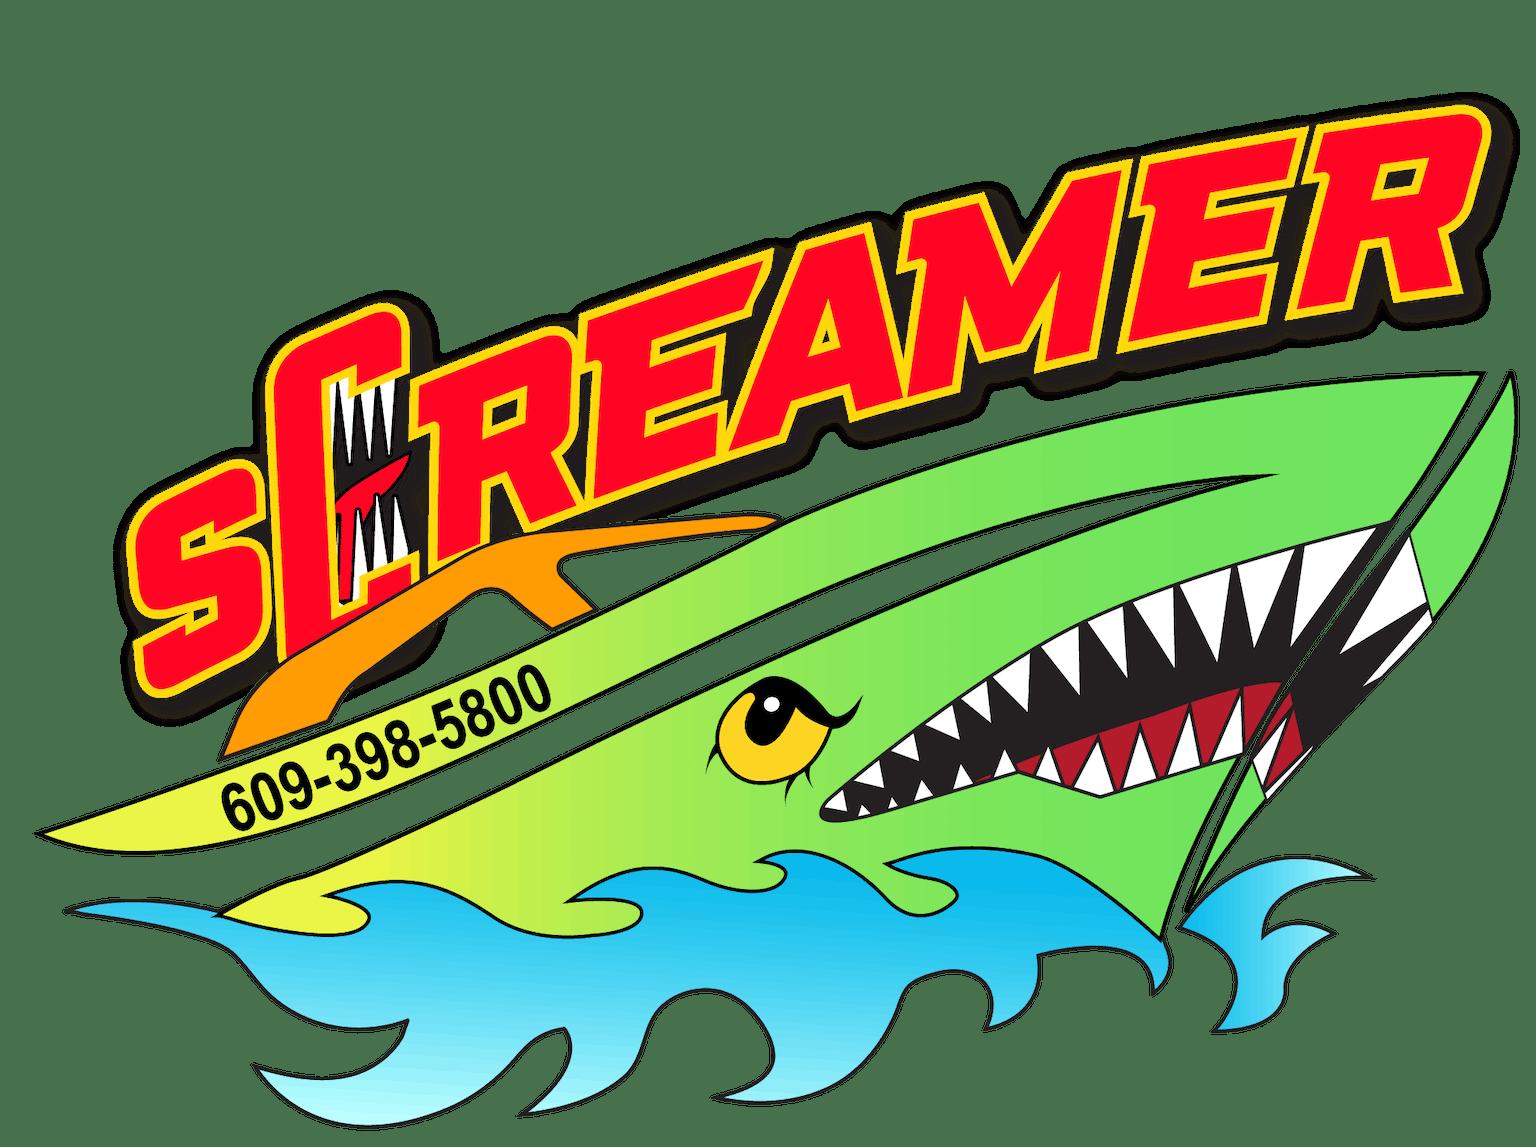 Final Screamer